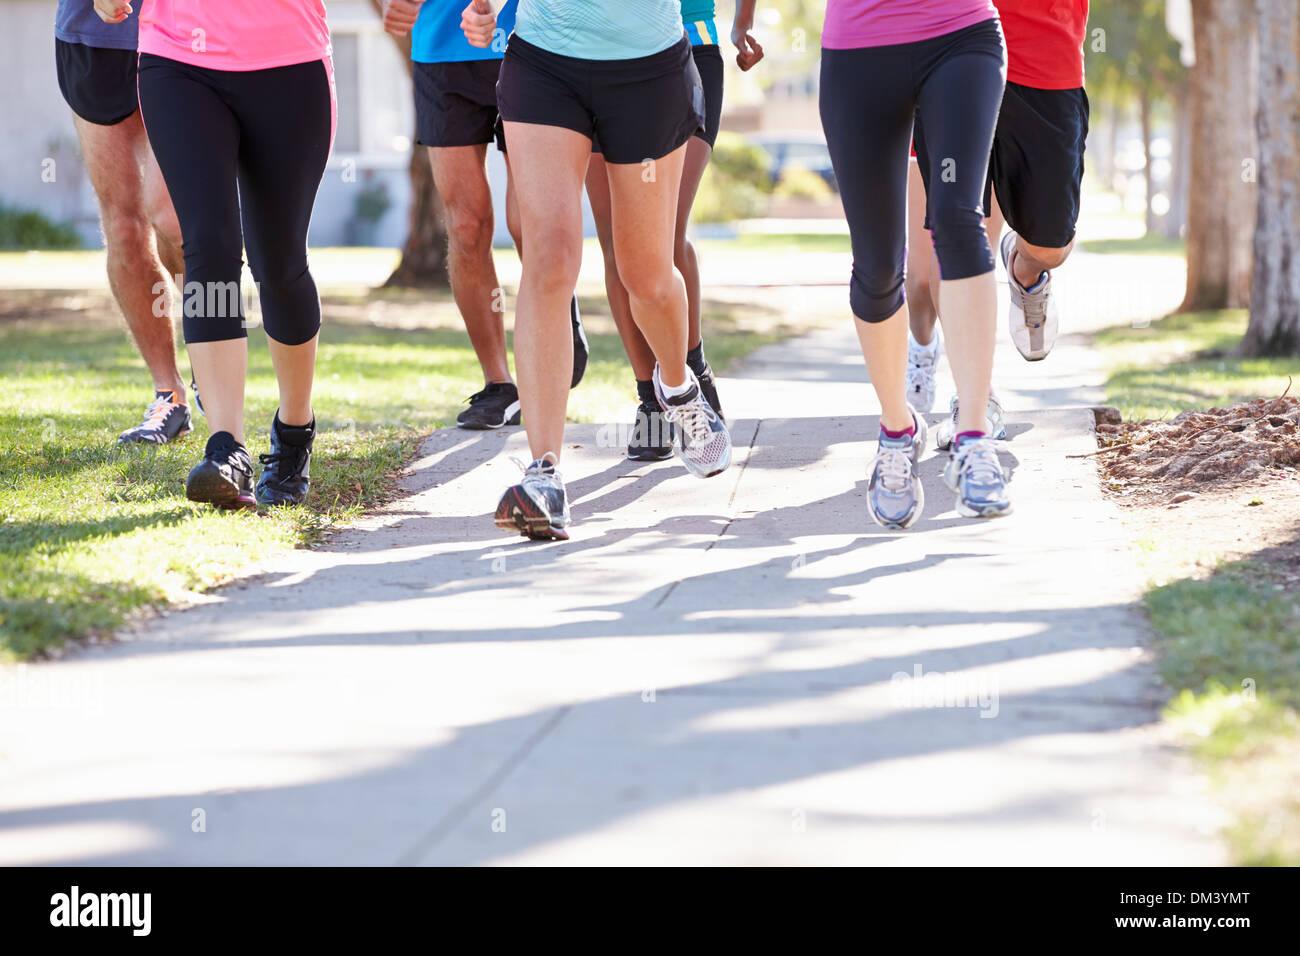 Close Up Of Runners Feet On Suburban Street Stock Photo